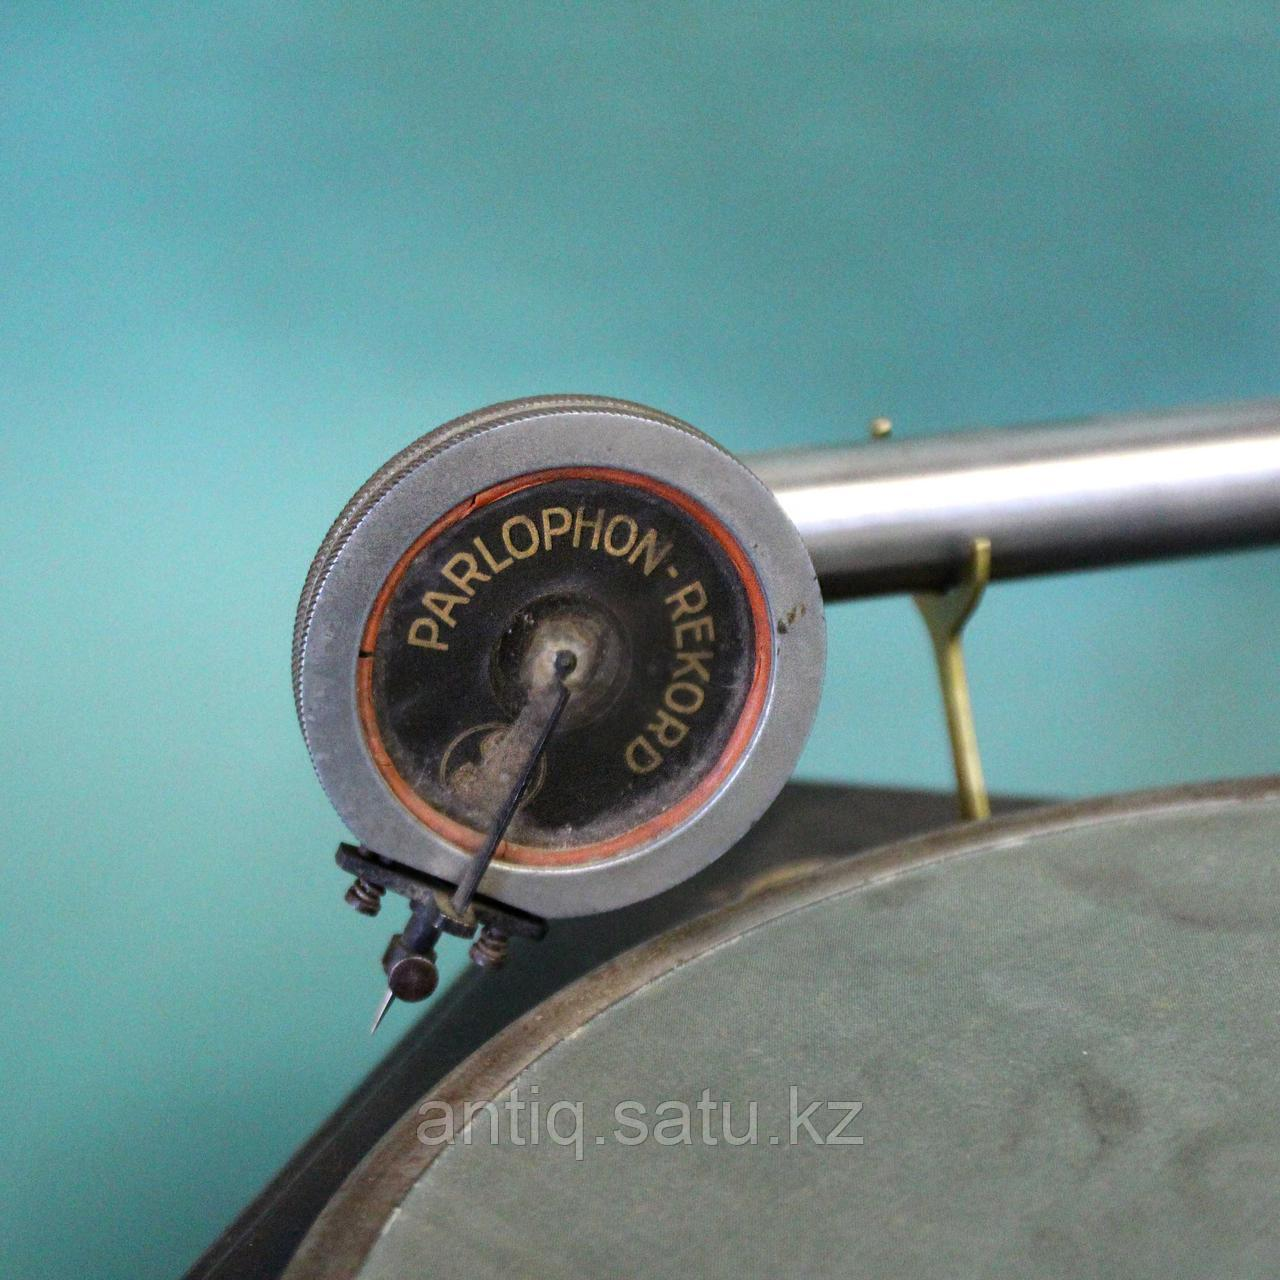 Граммофон. Фирма Thorens - фото 7